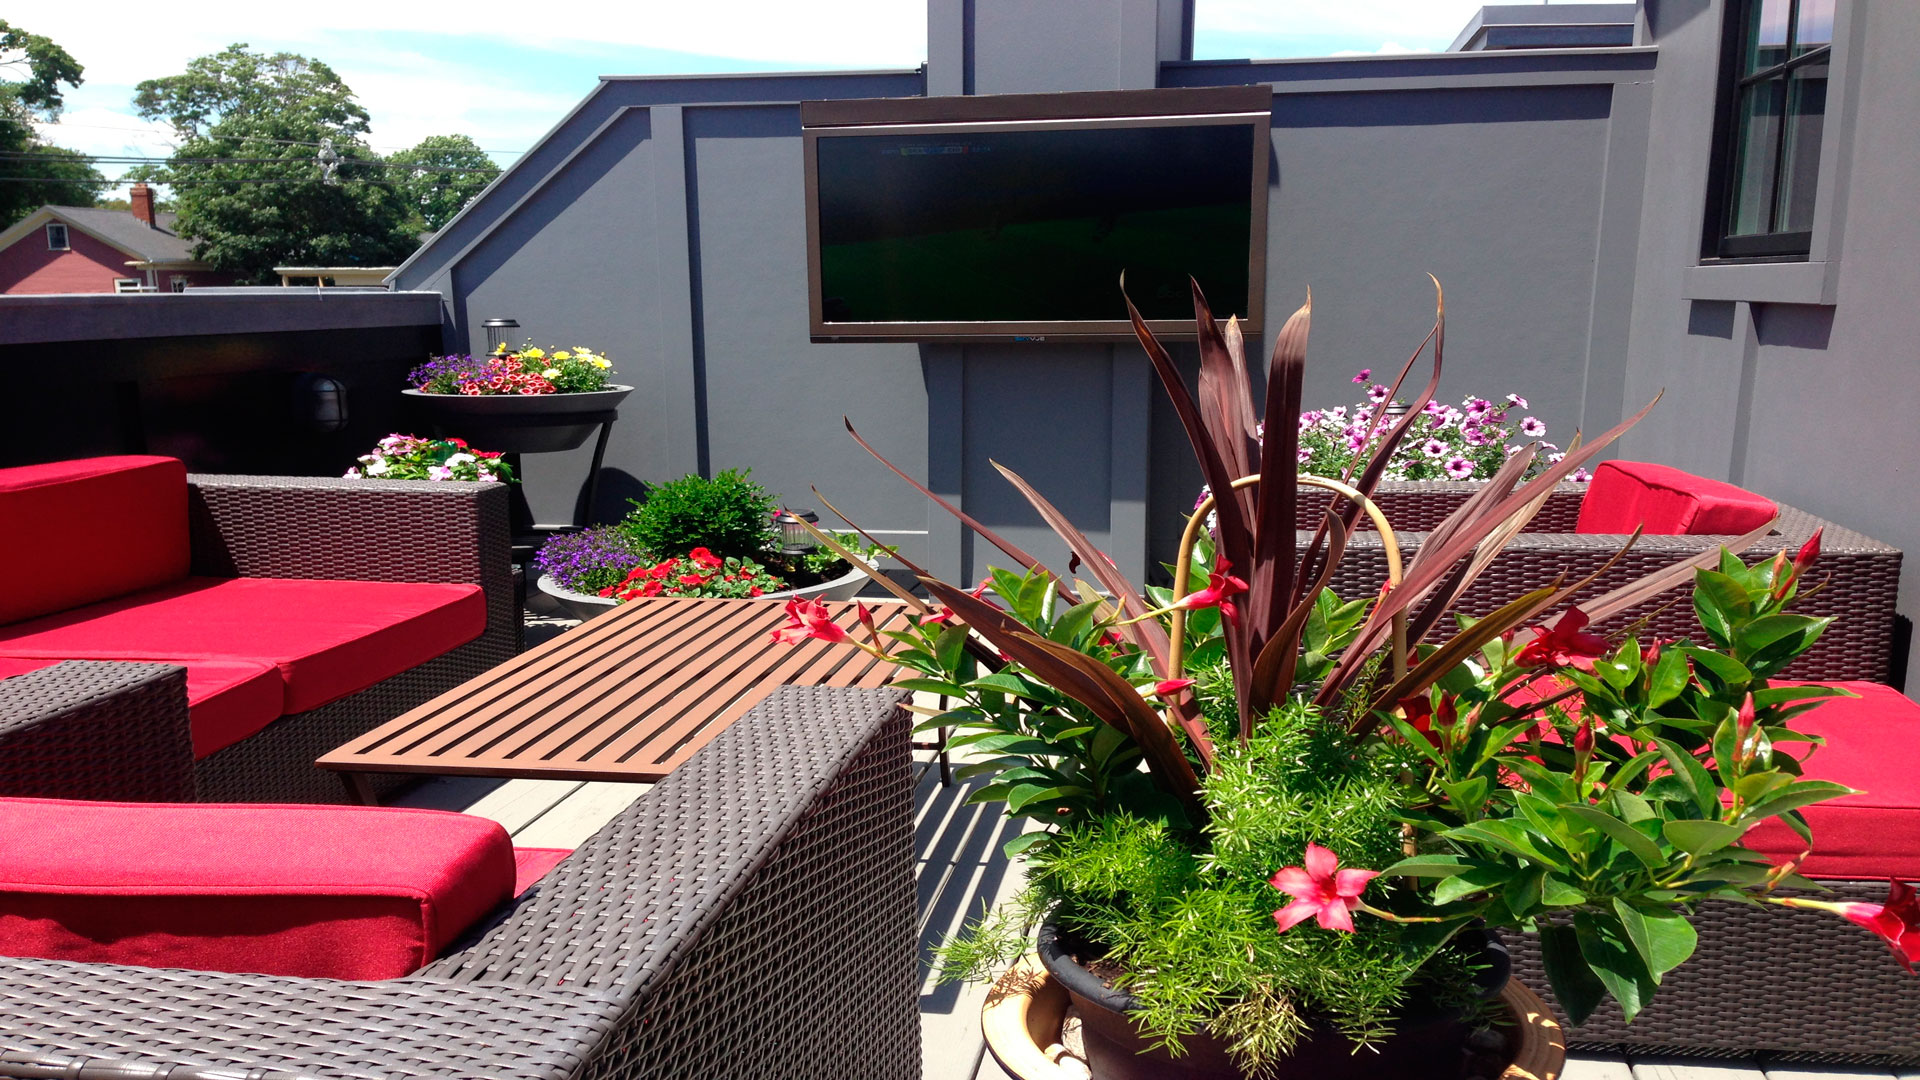 Cerrar una terraza perfect ideas para decorar casas - Ideas para cerrar una terraza ...